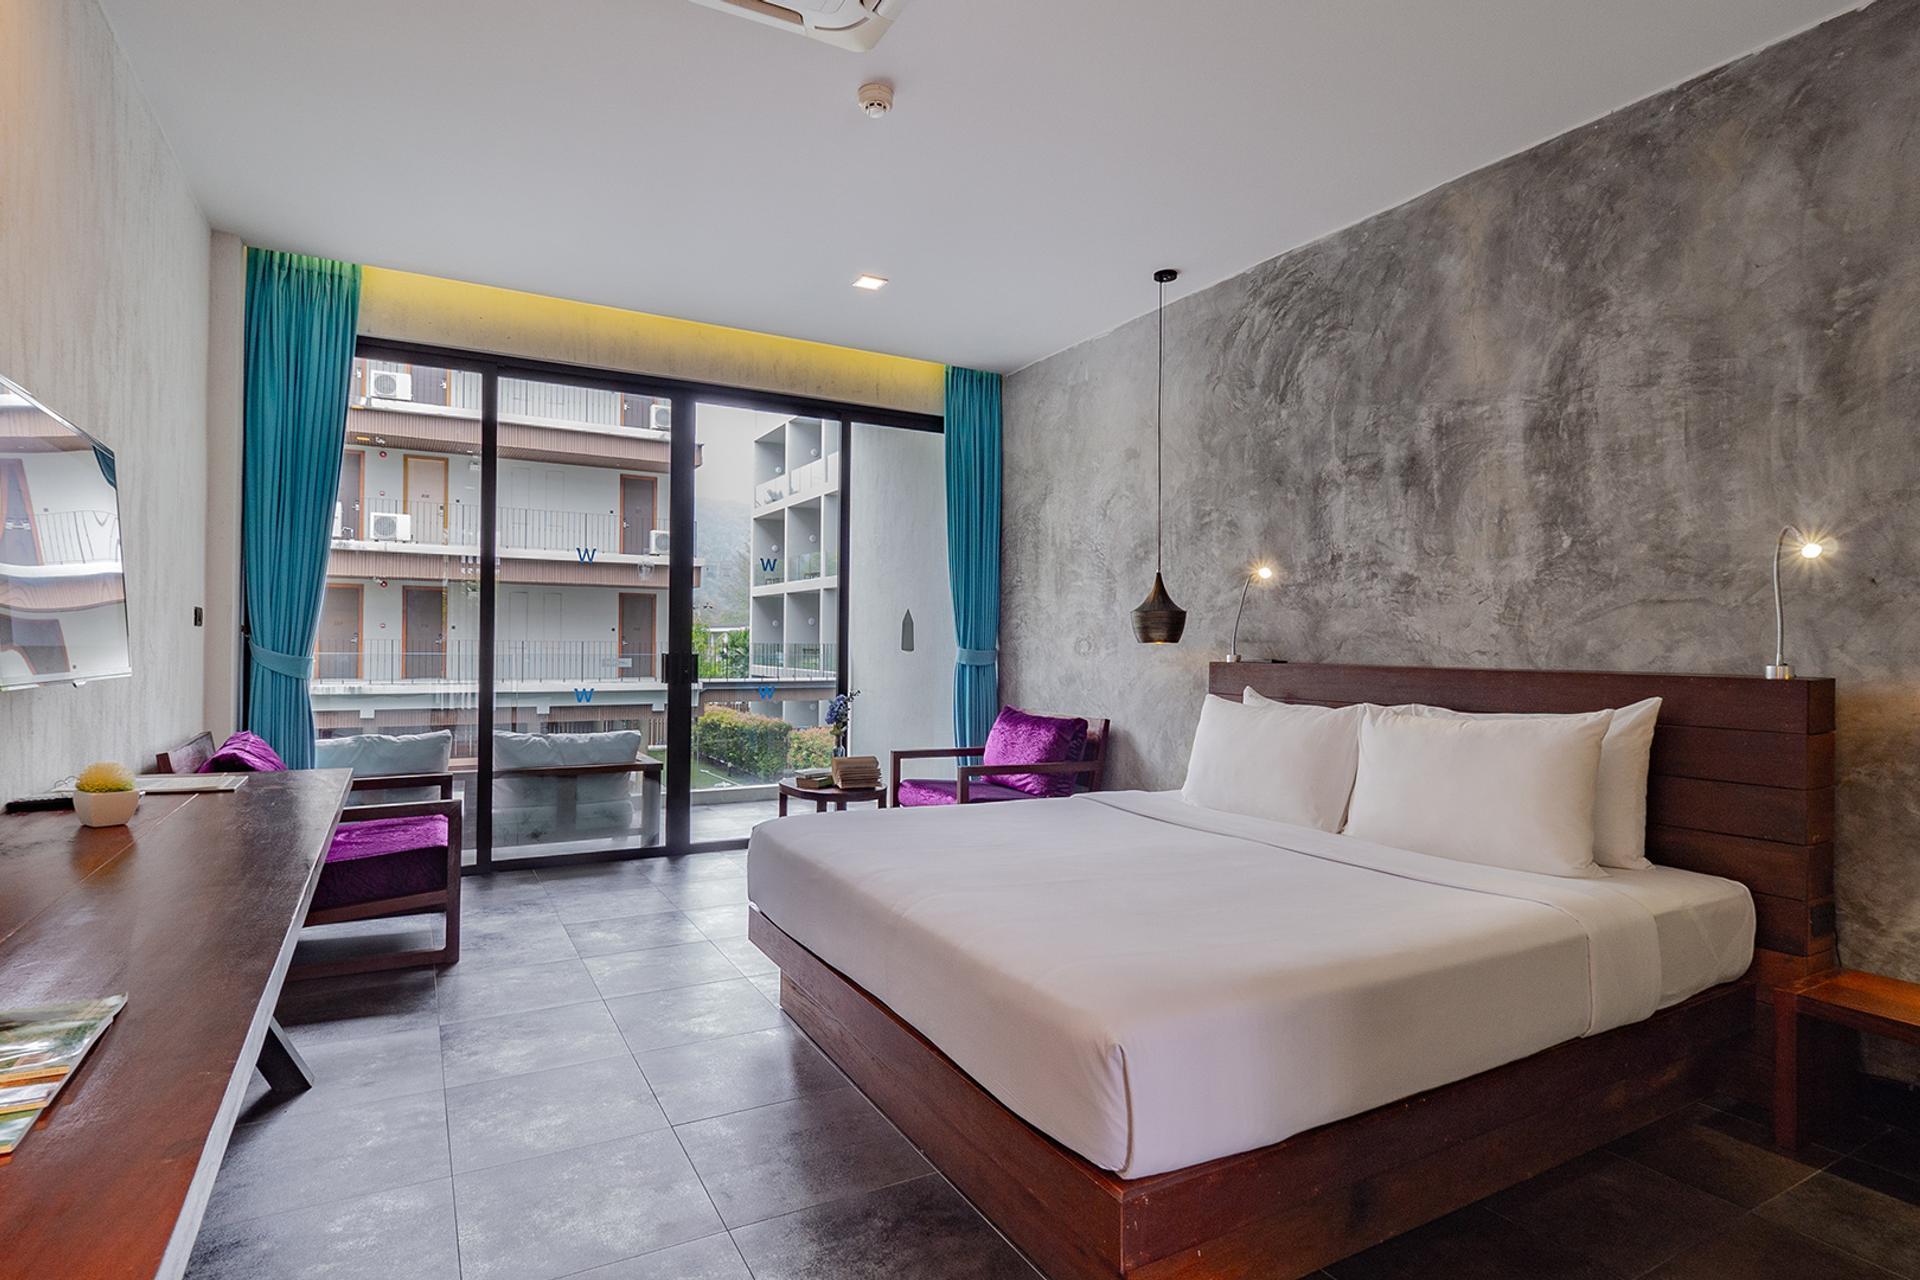 Room image